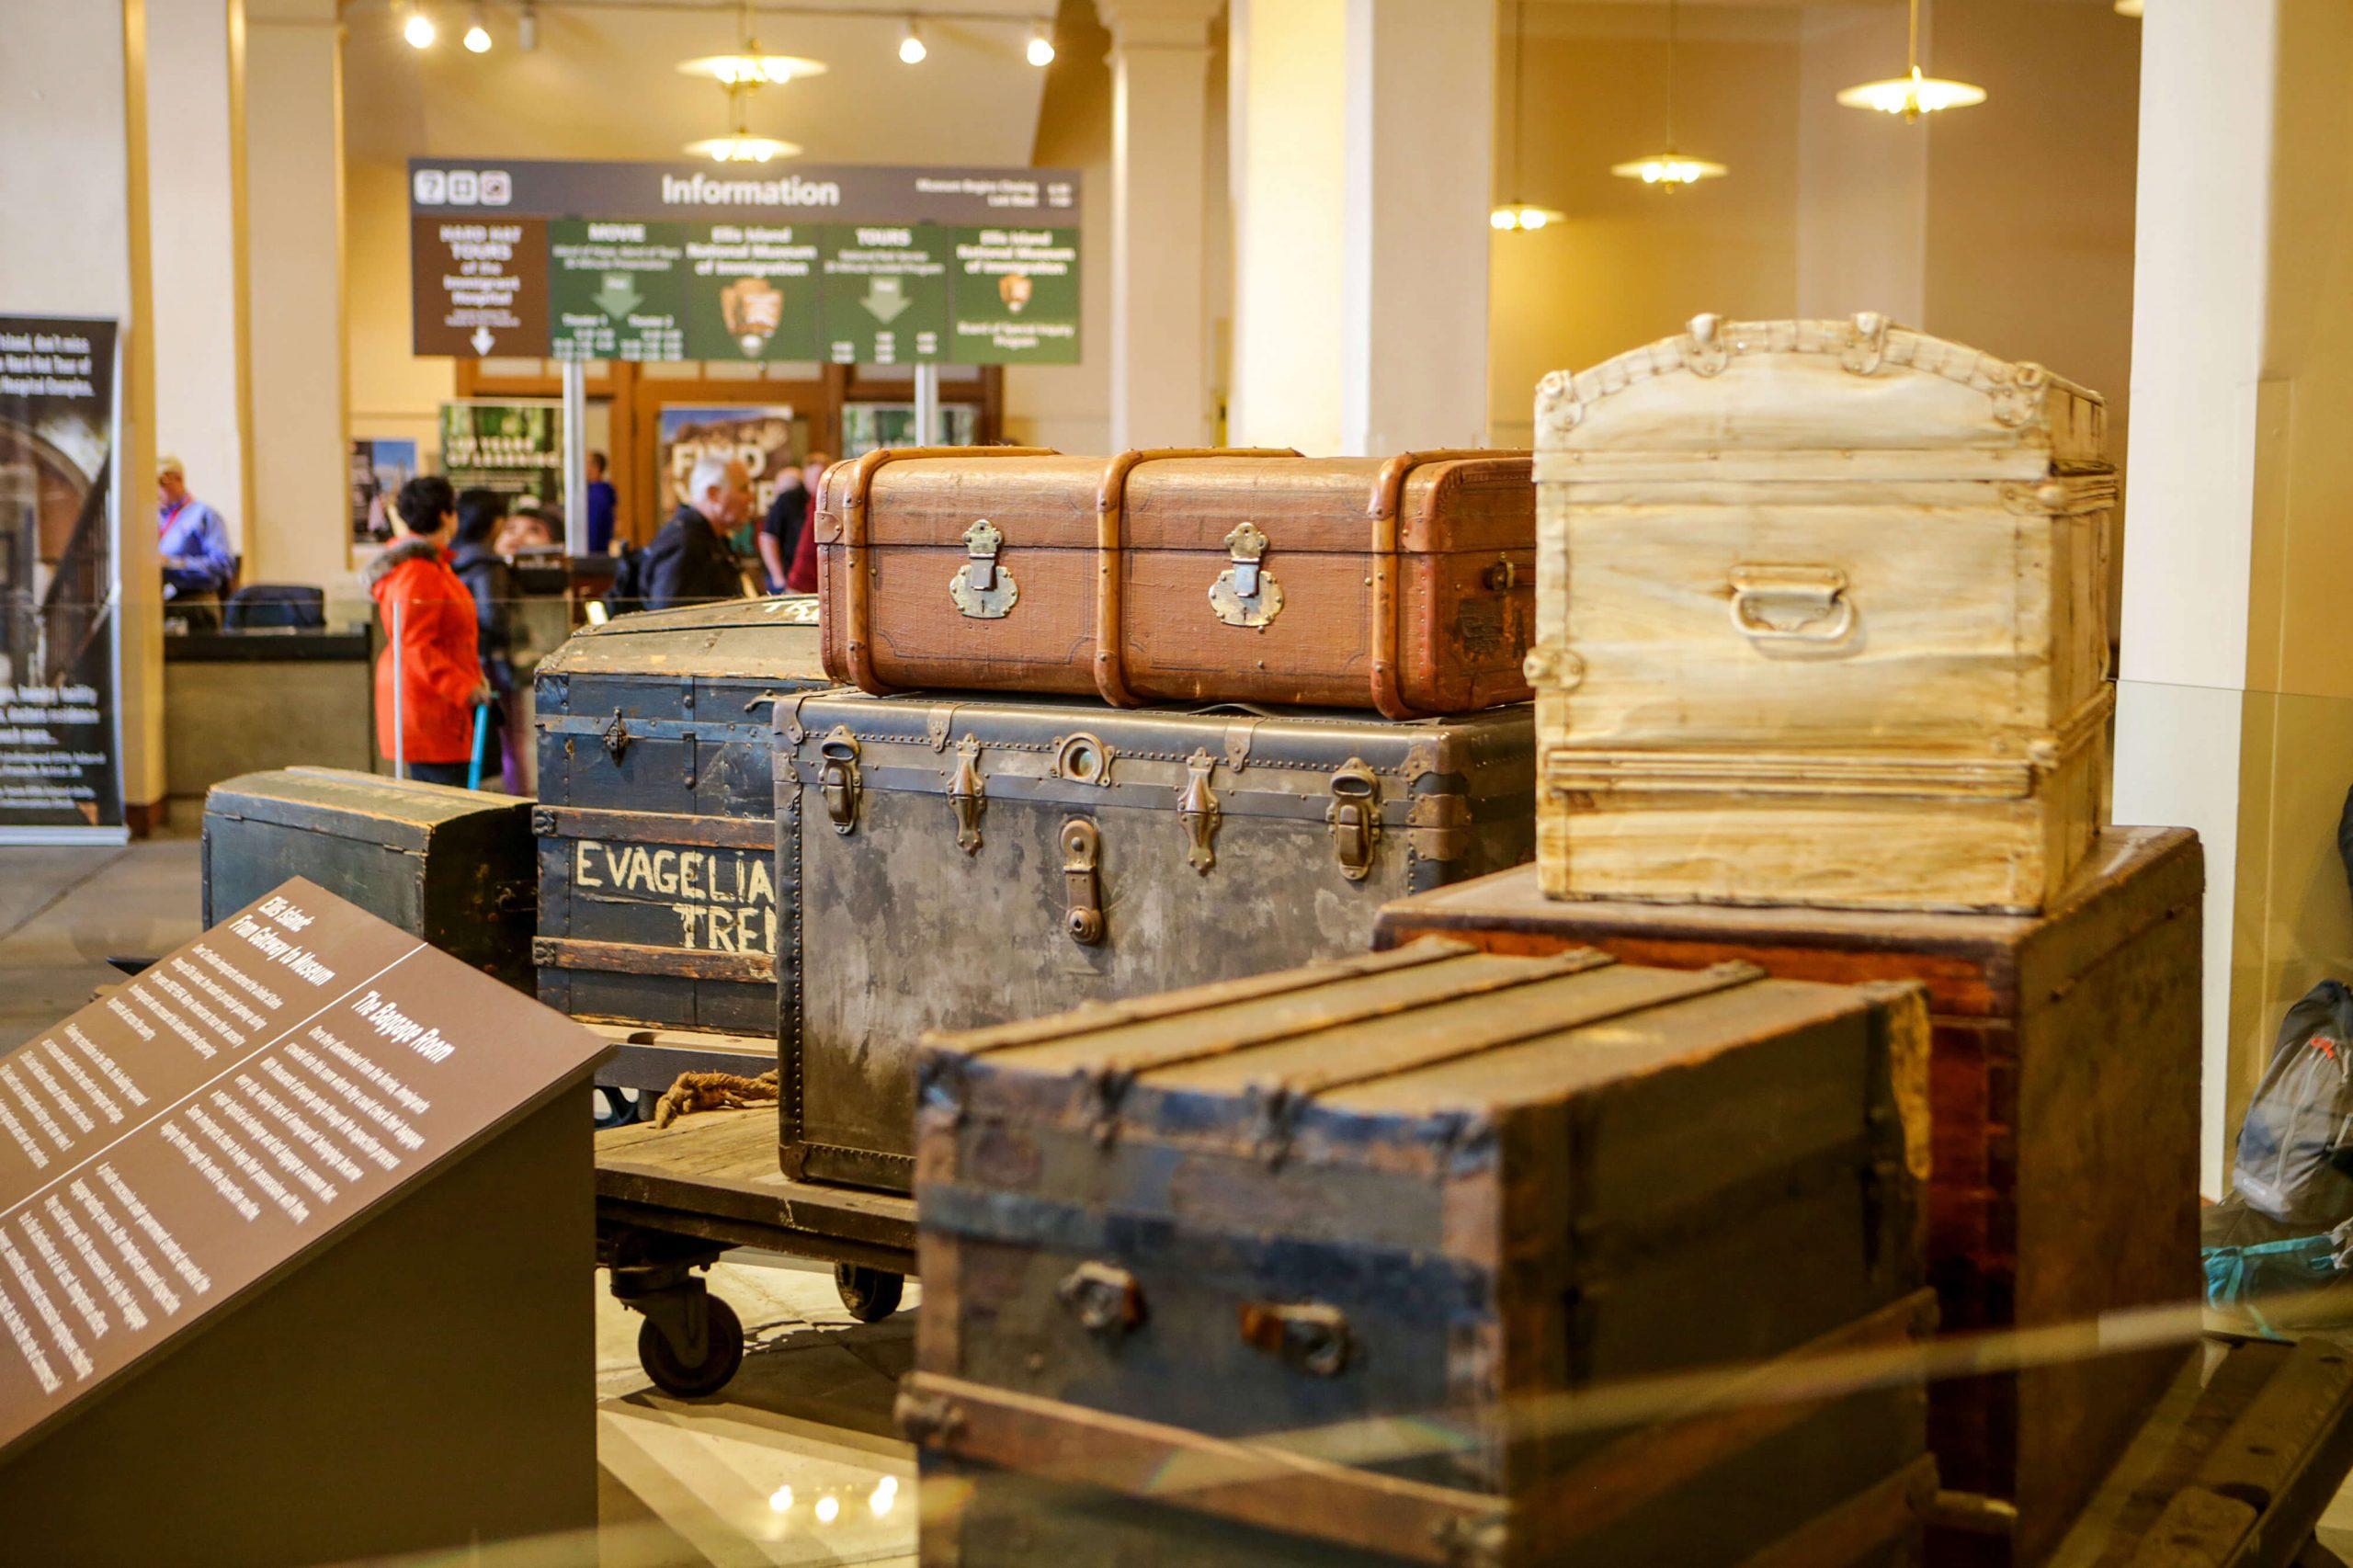 Baggage Room at the Ellis Island museum